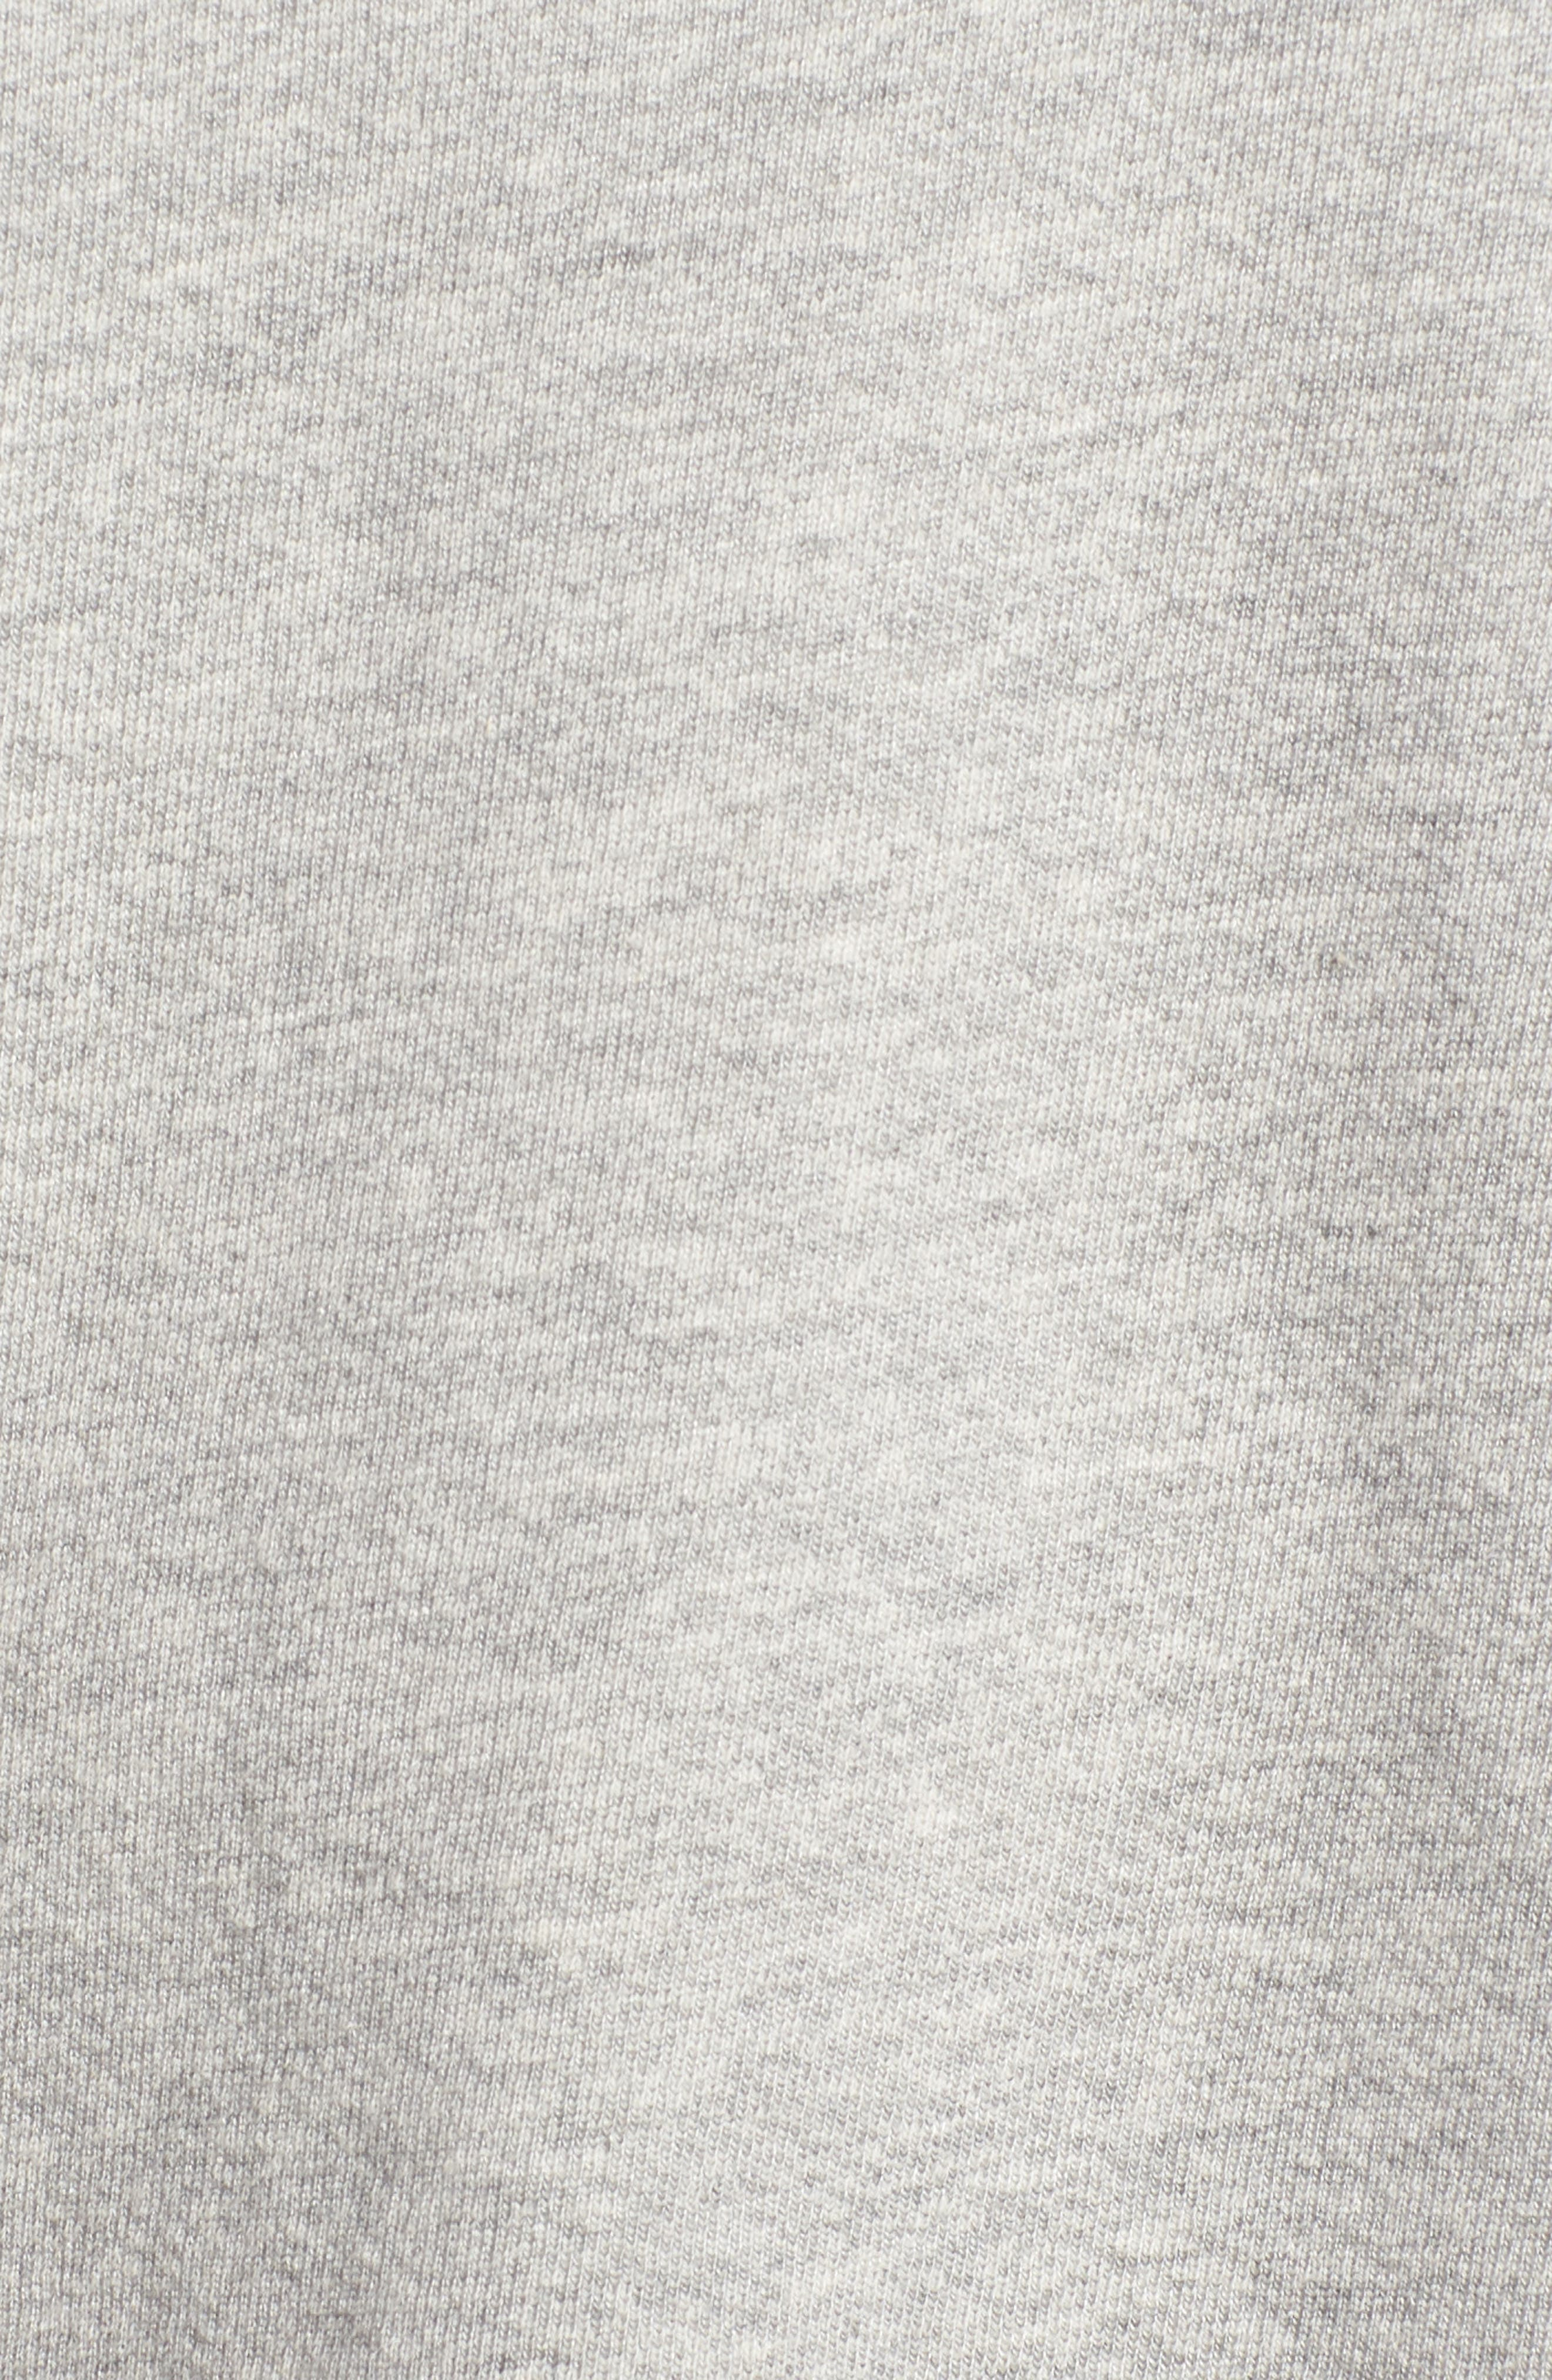 Mother Daughter Sister Sweatshirt,                             Alternate thumbnail 5, color,                             039